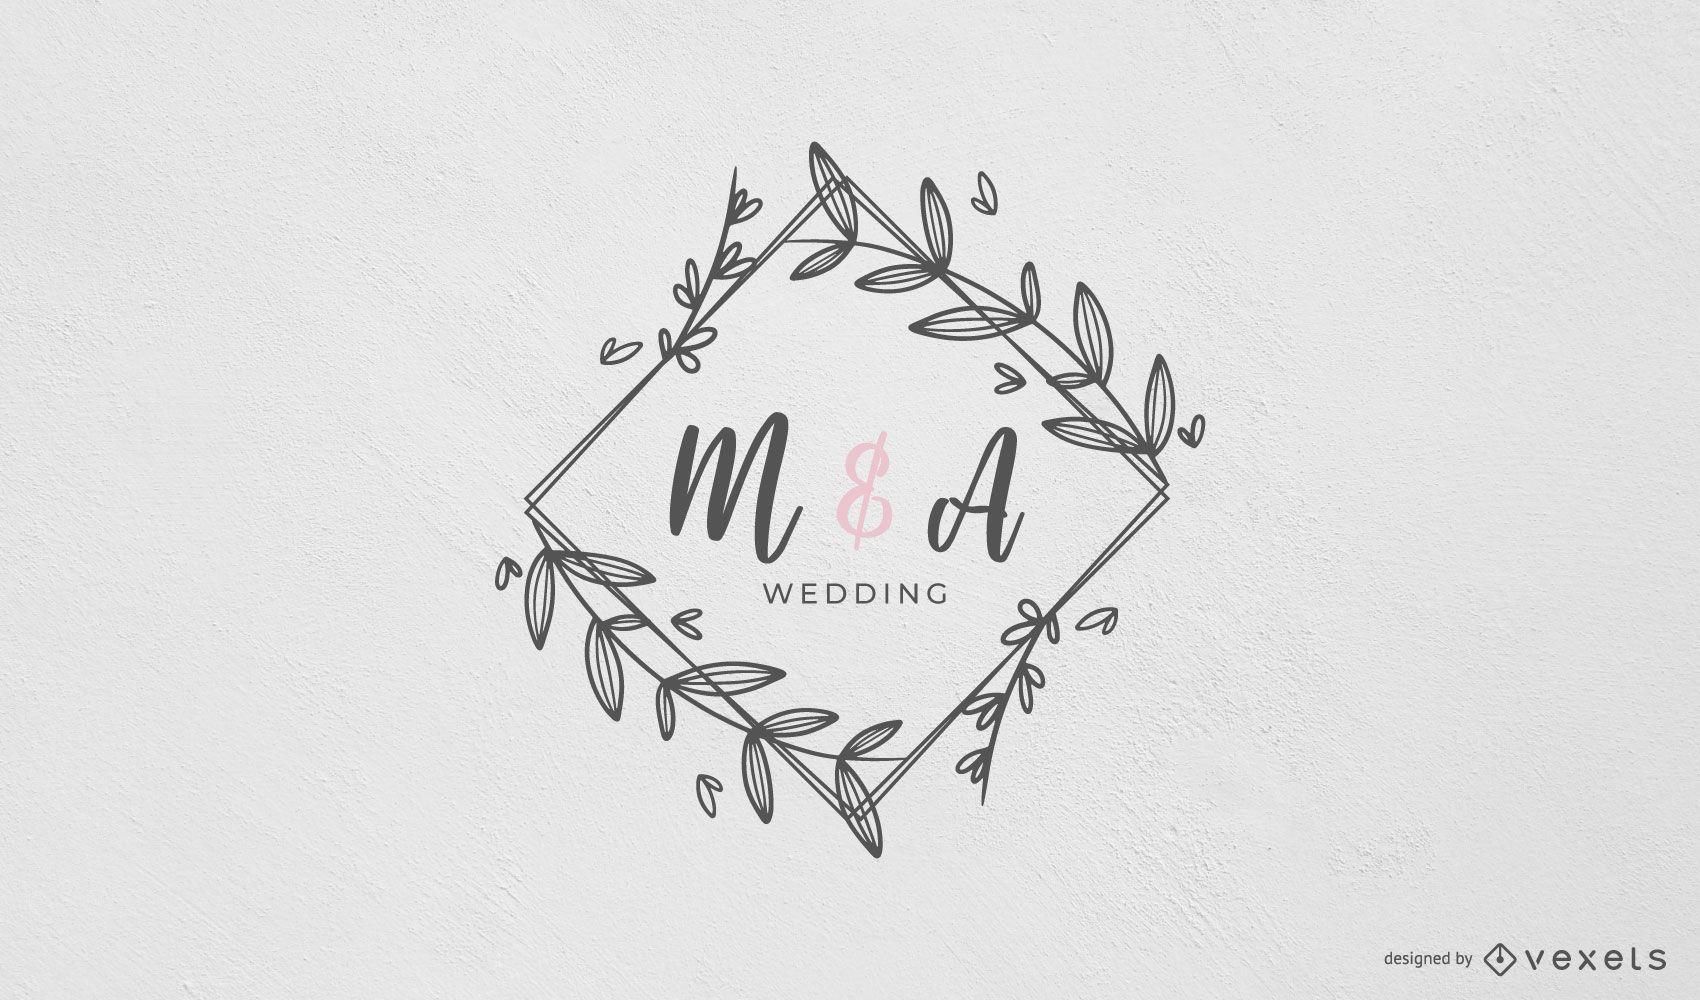 Monograma de boda con diseño de marco